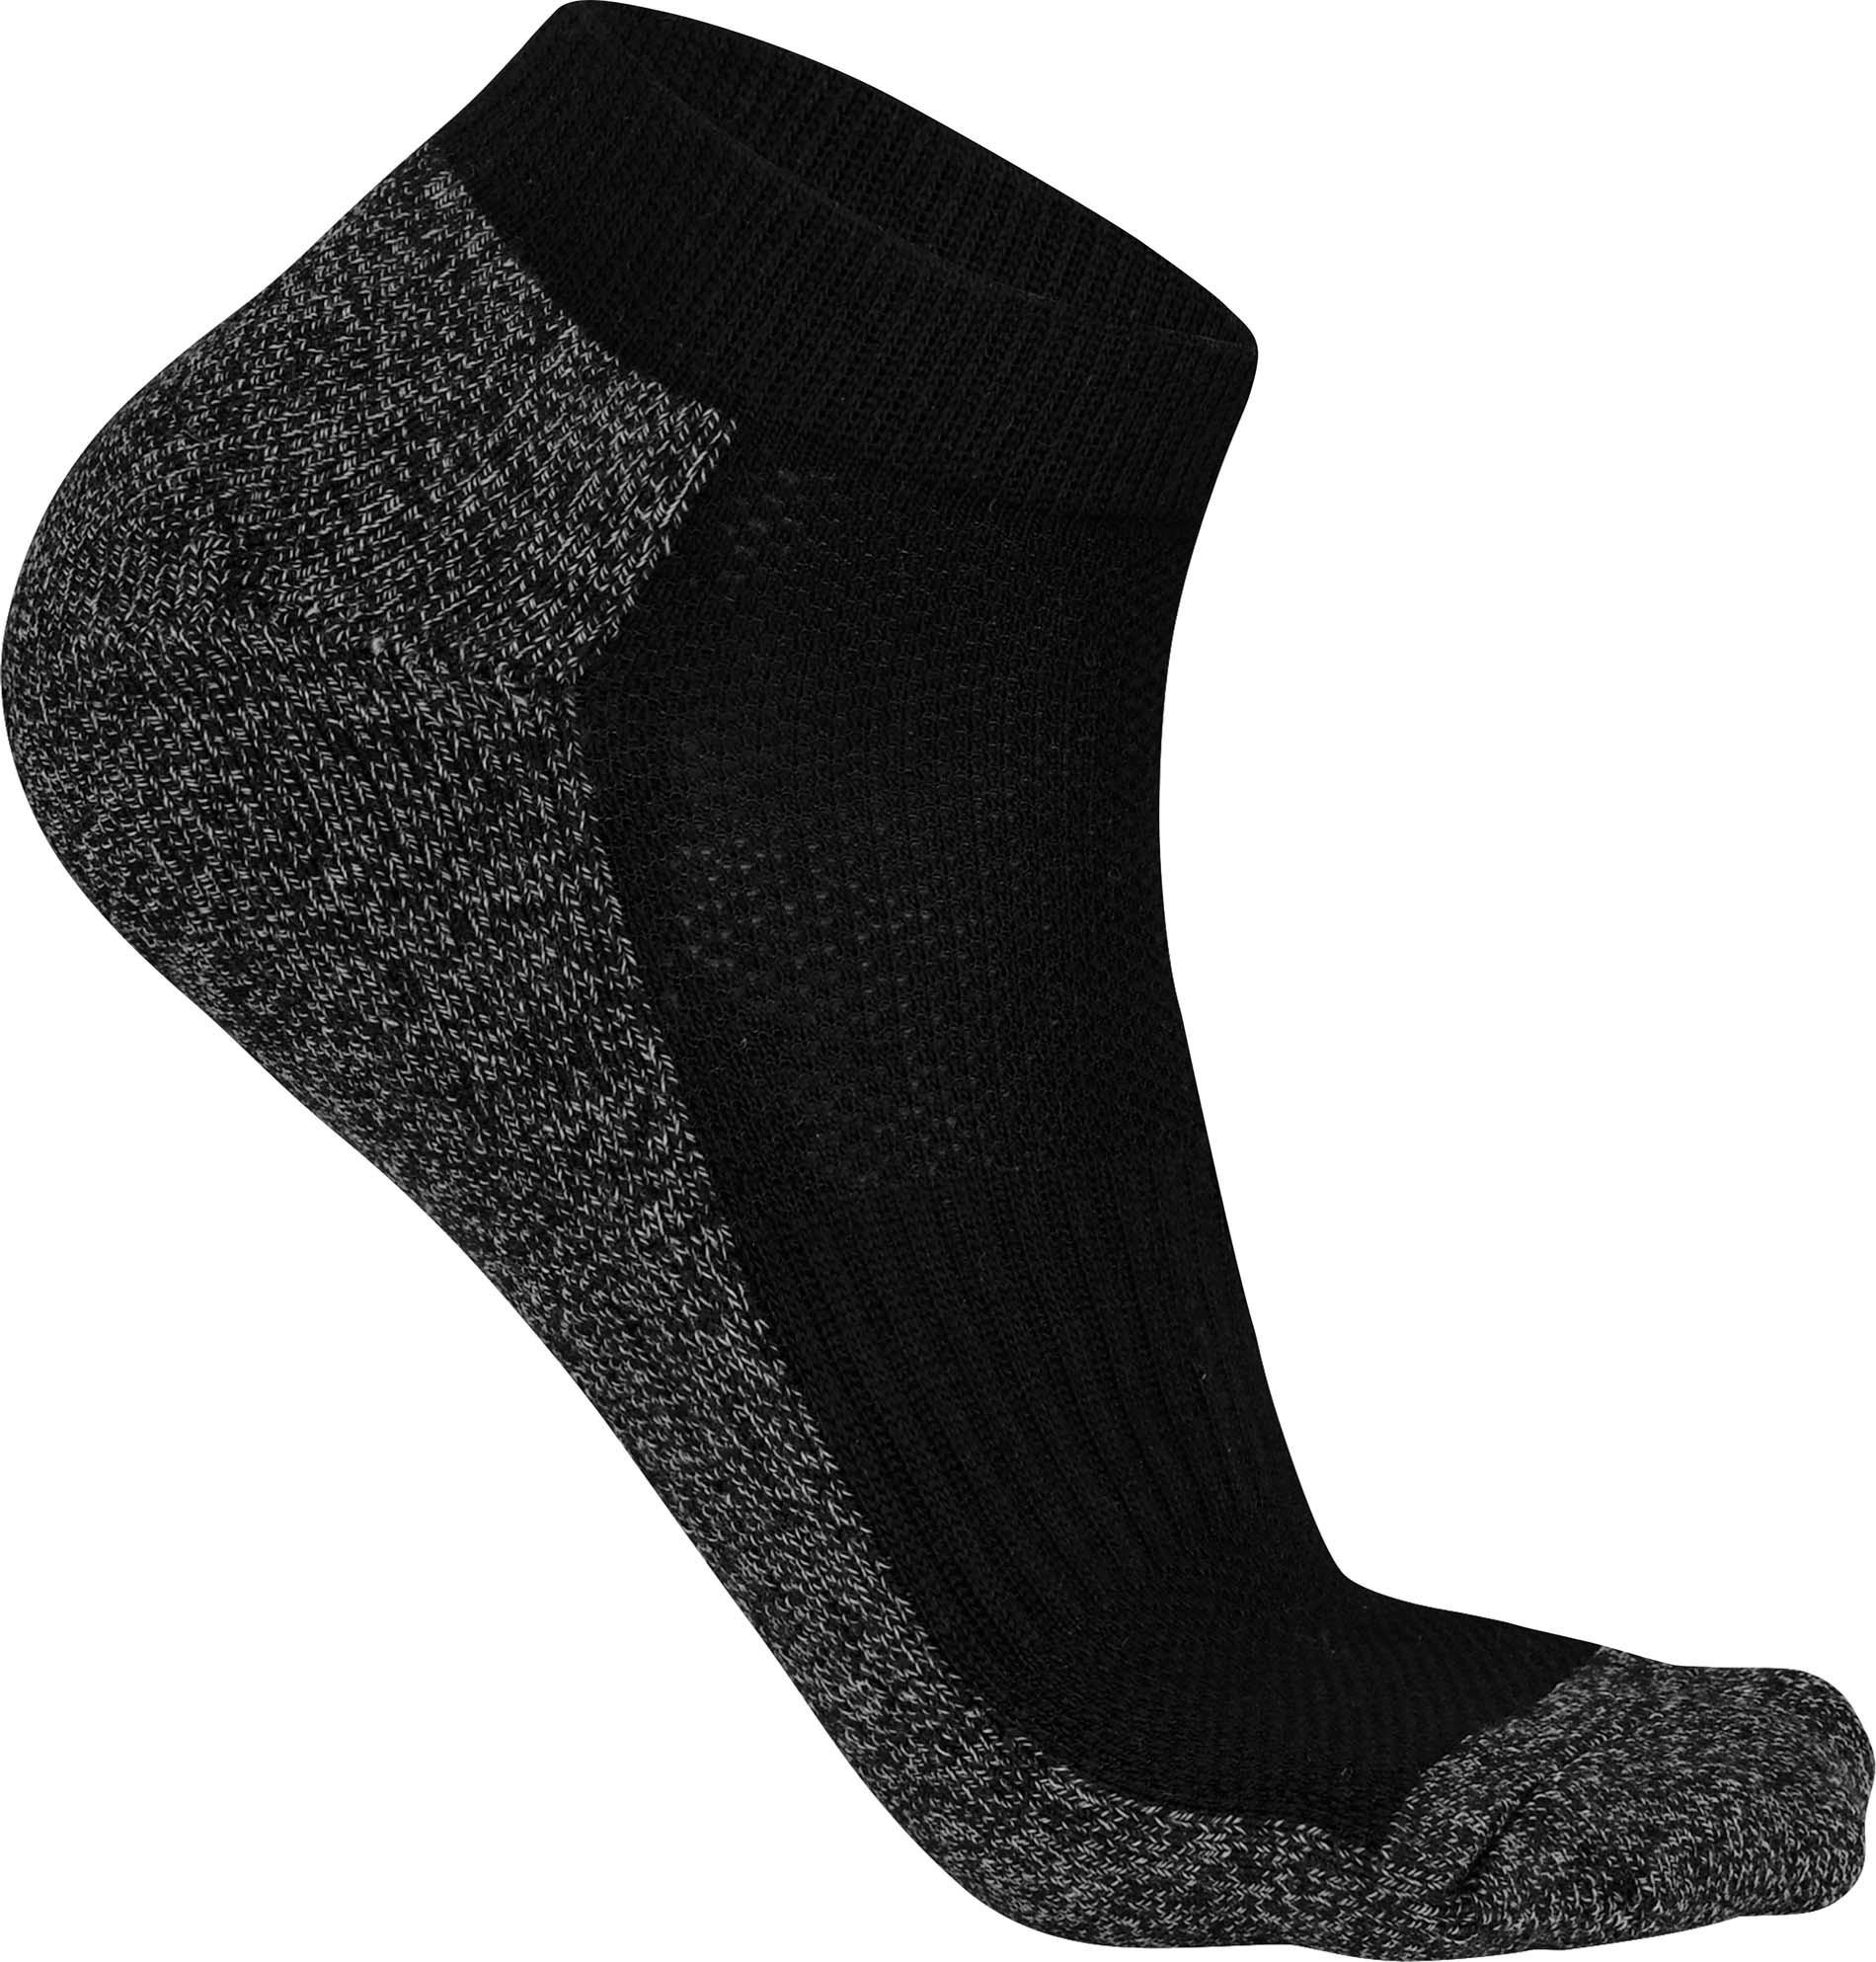 Socquettes multisports - 2-1606-2